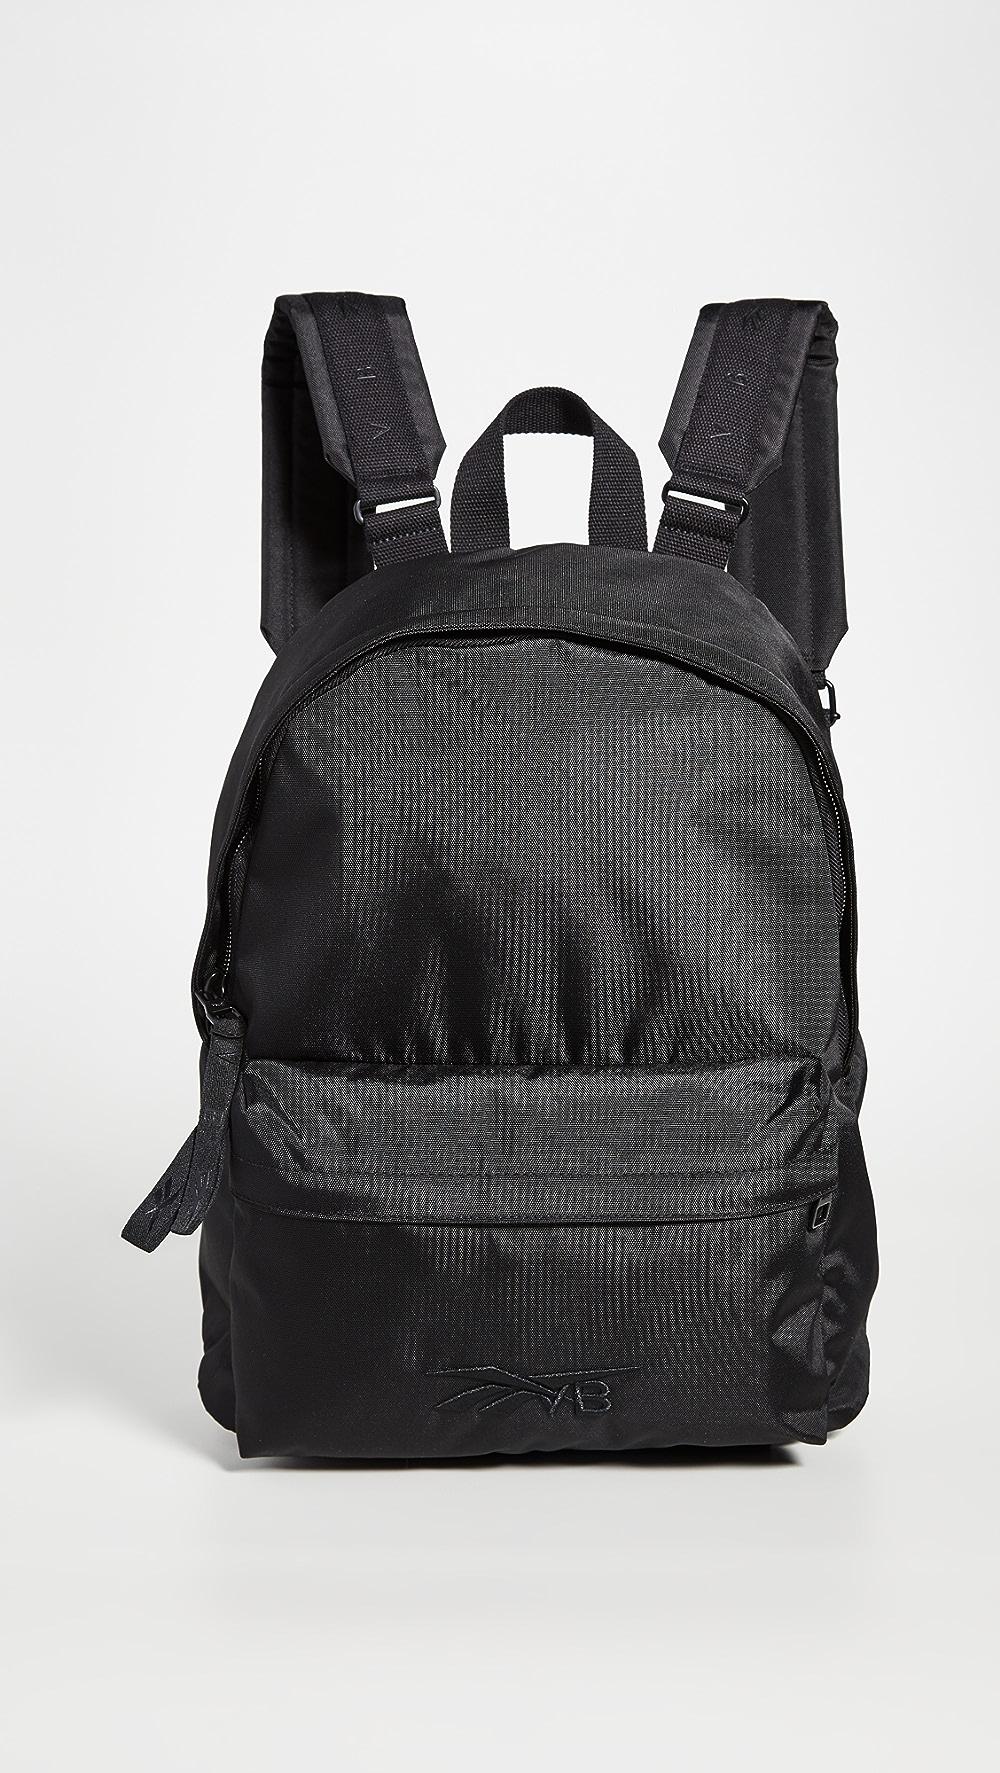 Capable Reebok X Victoria Beckham - Rbk Vb Backpack Profit Small